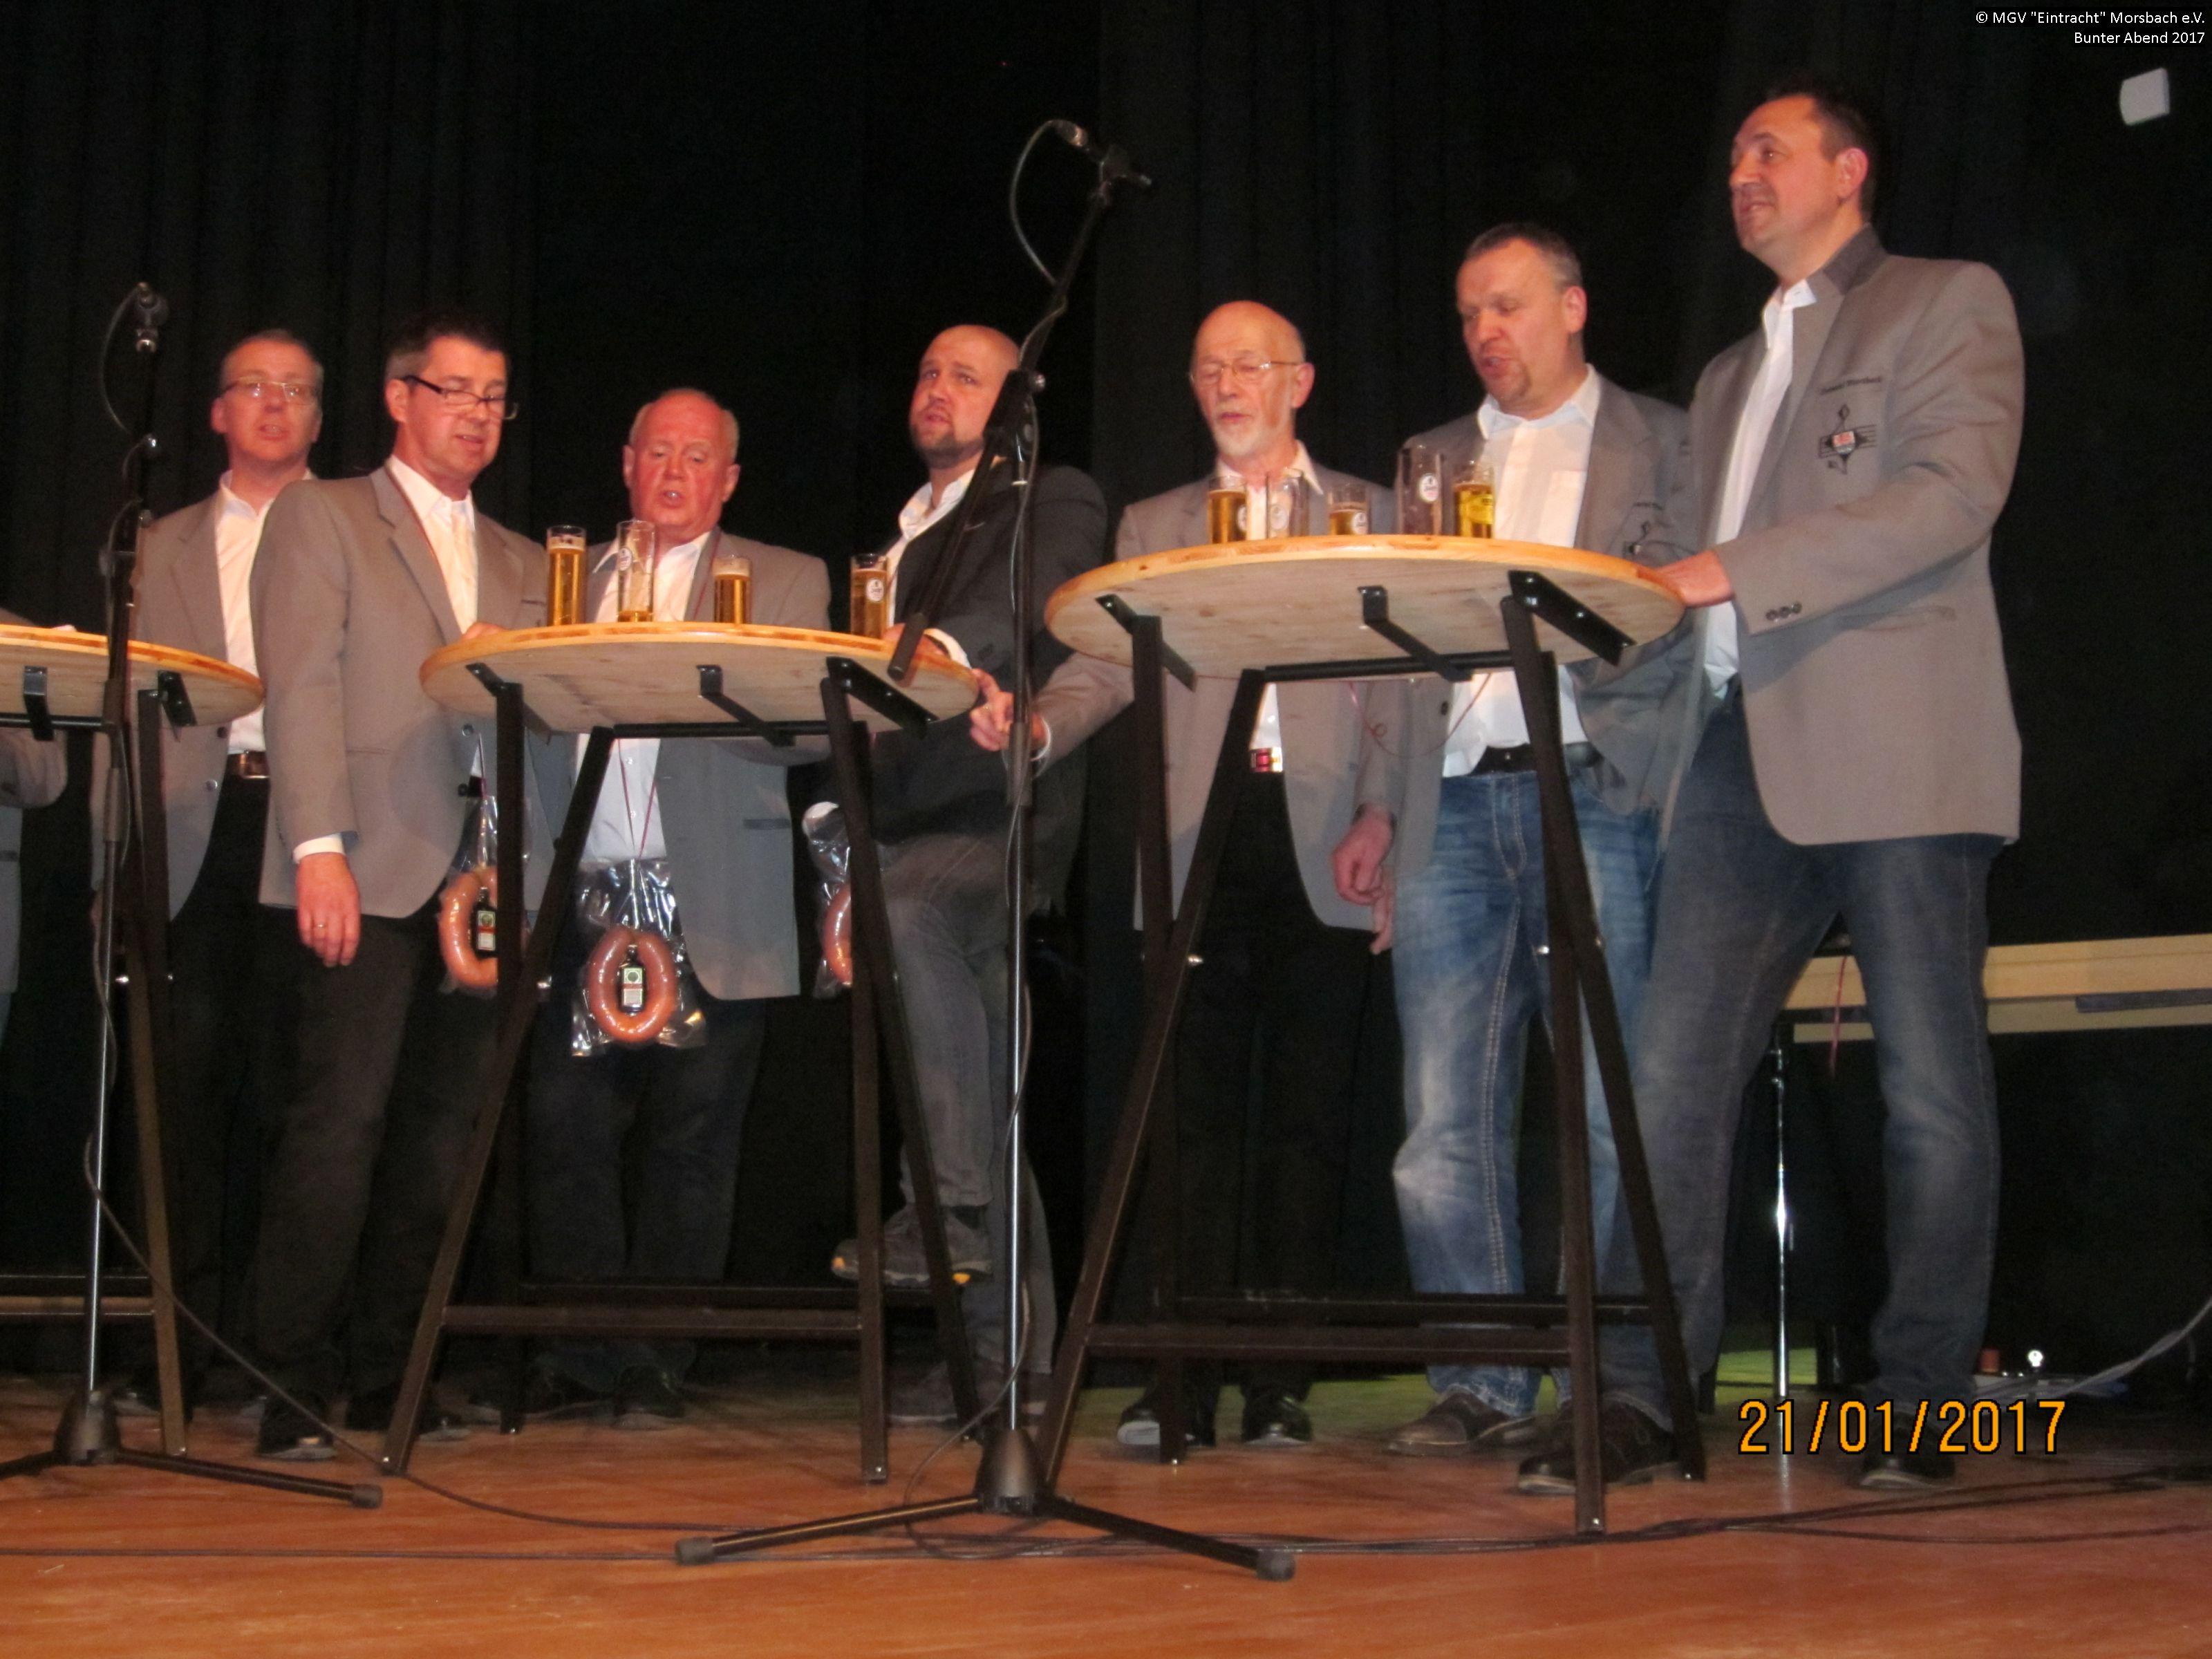 MGV_Eintracht_Morsbach_Bunter_Abend_2017_199